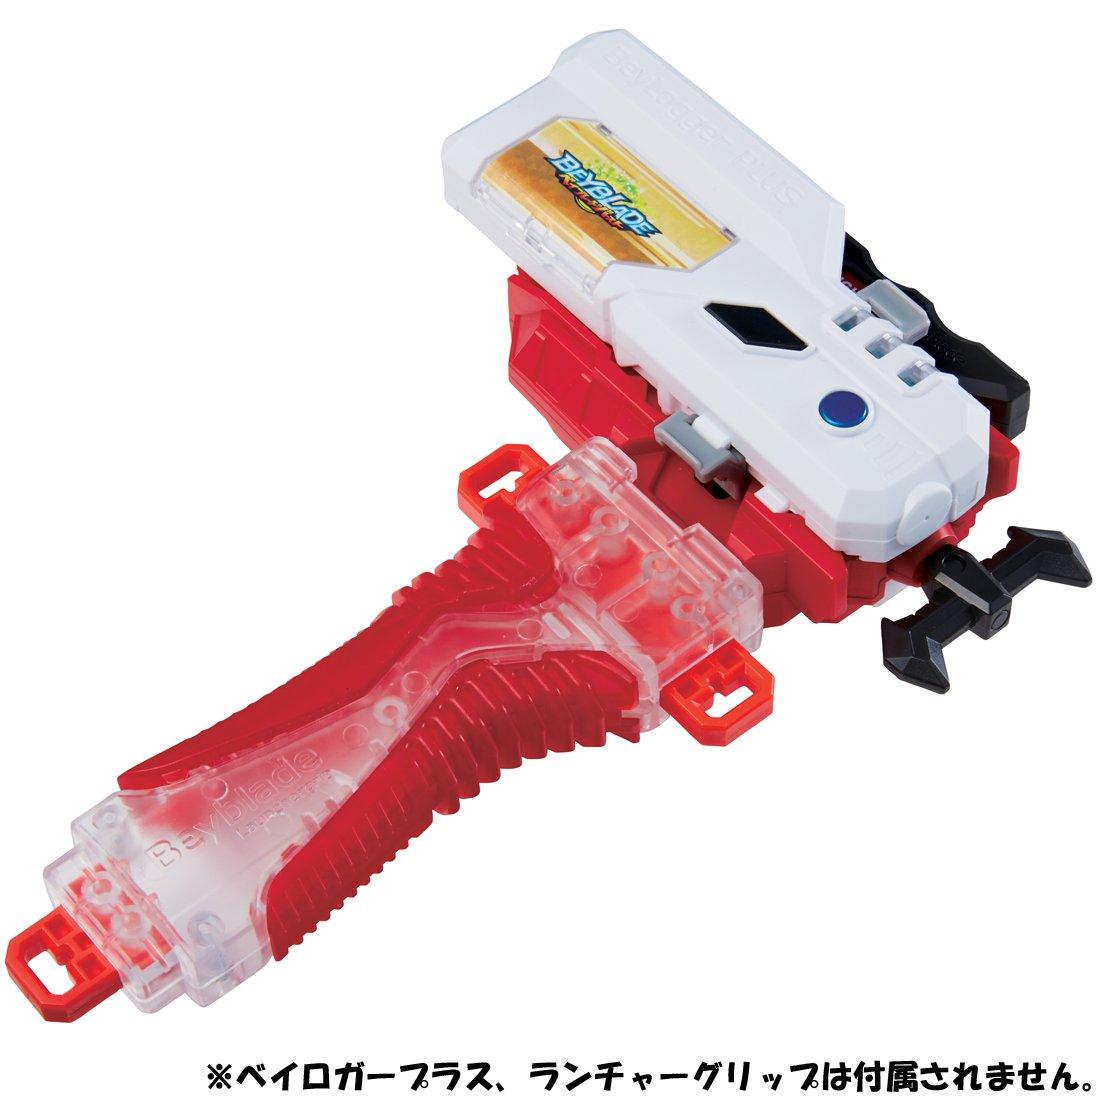 Takaratomy Beyblade Burst B-88 Bey Launcher LR Toy by Takaratomy (Image #3)